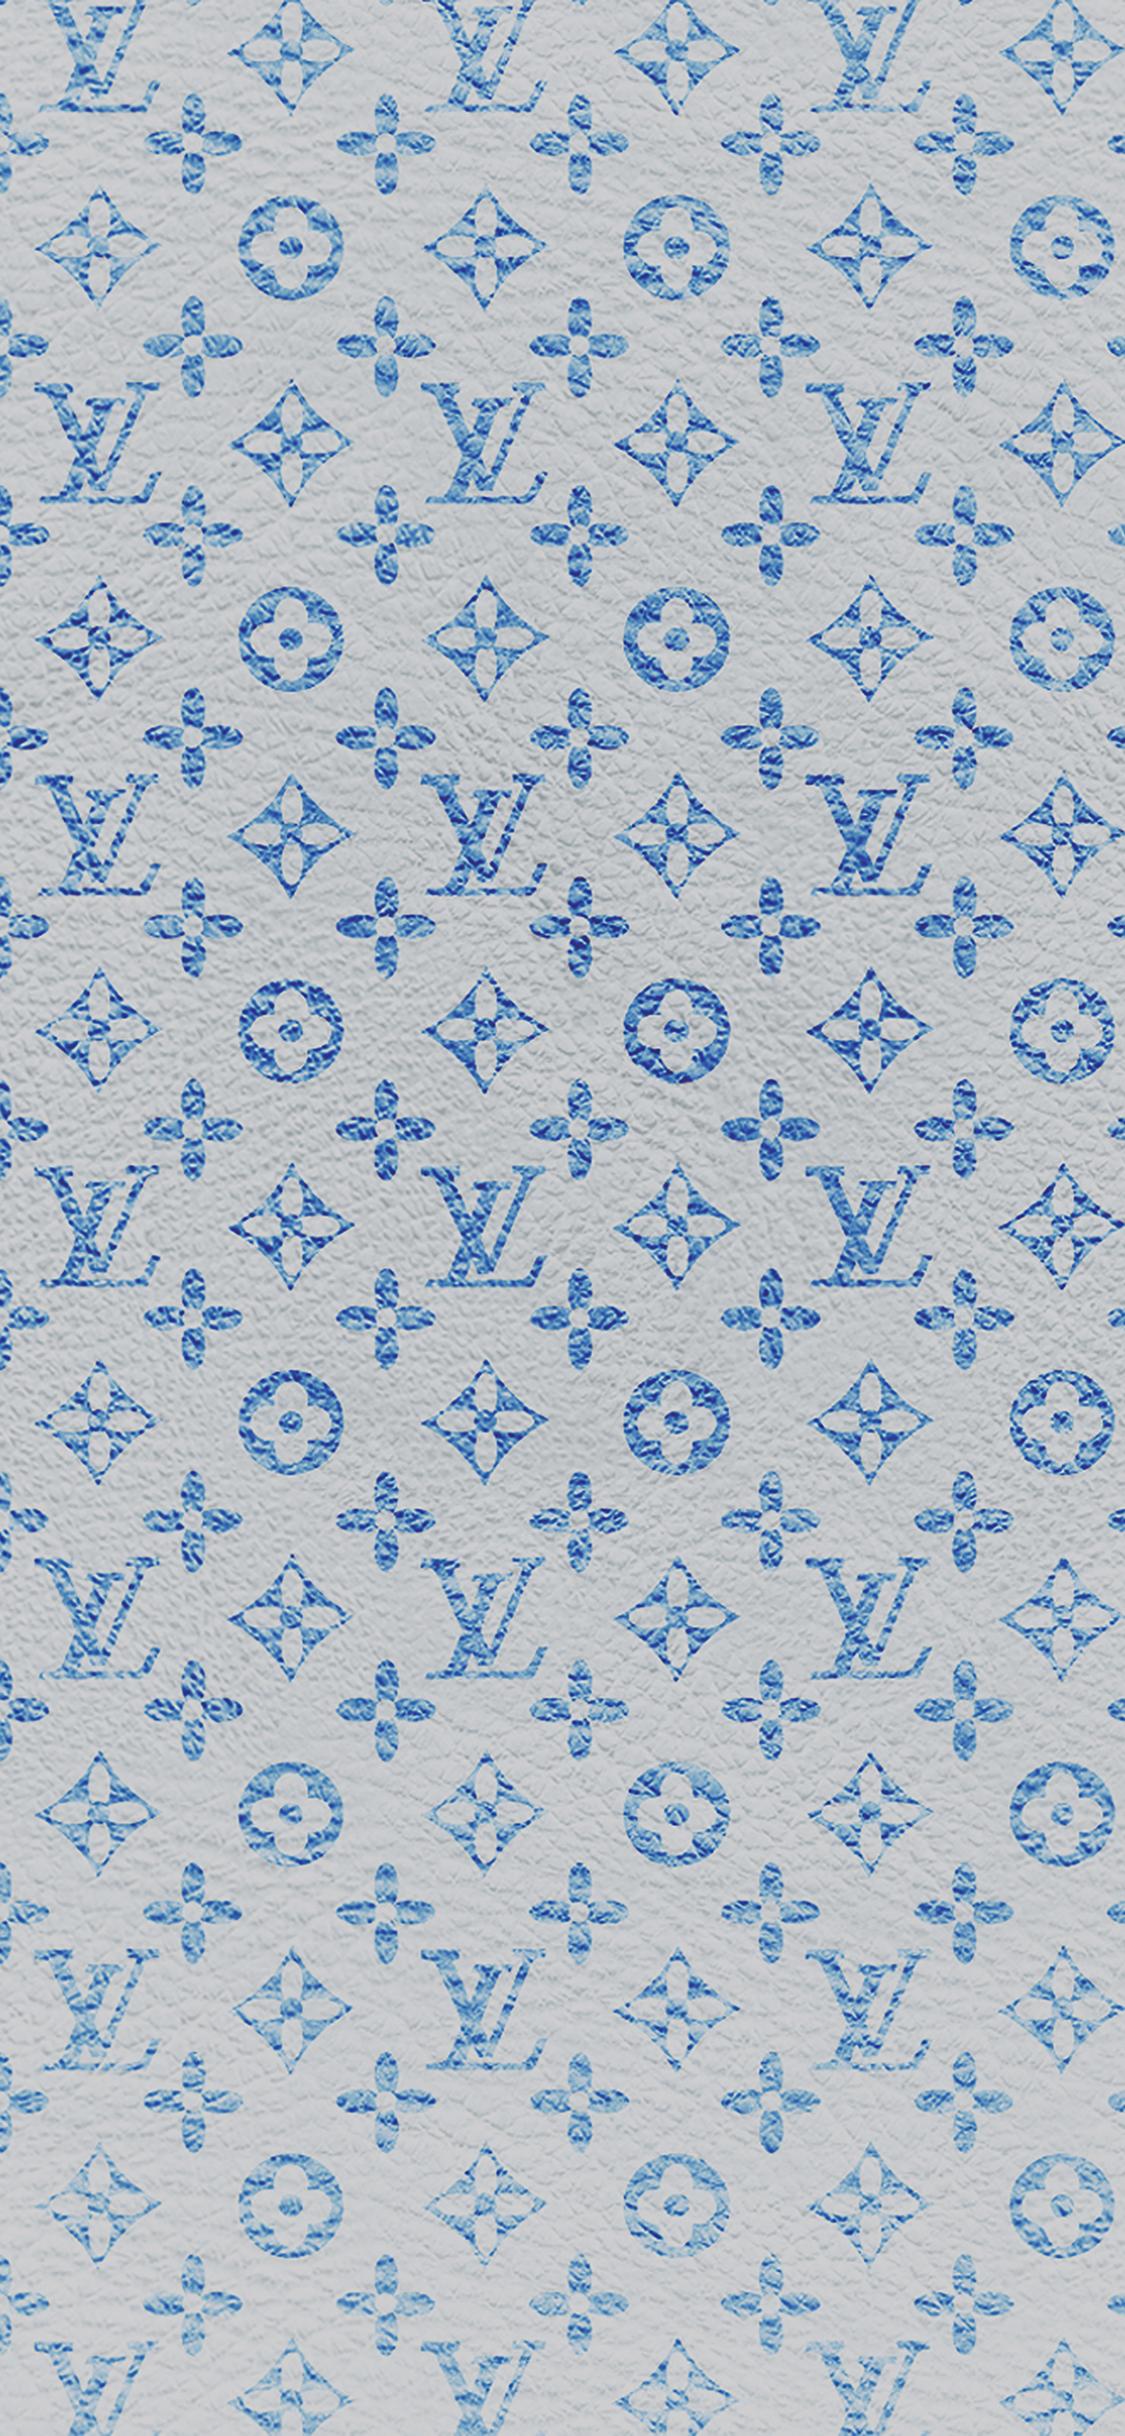 Best Louis Vuitton Iphone X Wallpapers Hd Ilikewallpaper